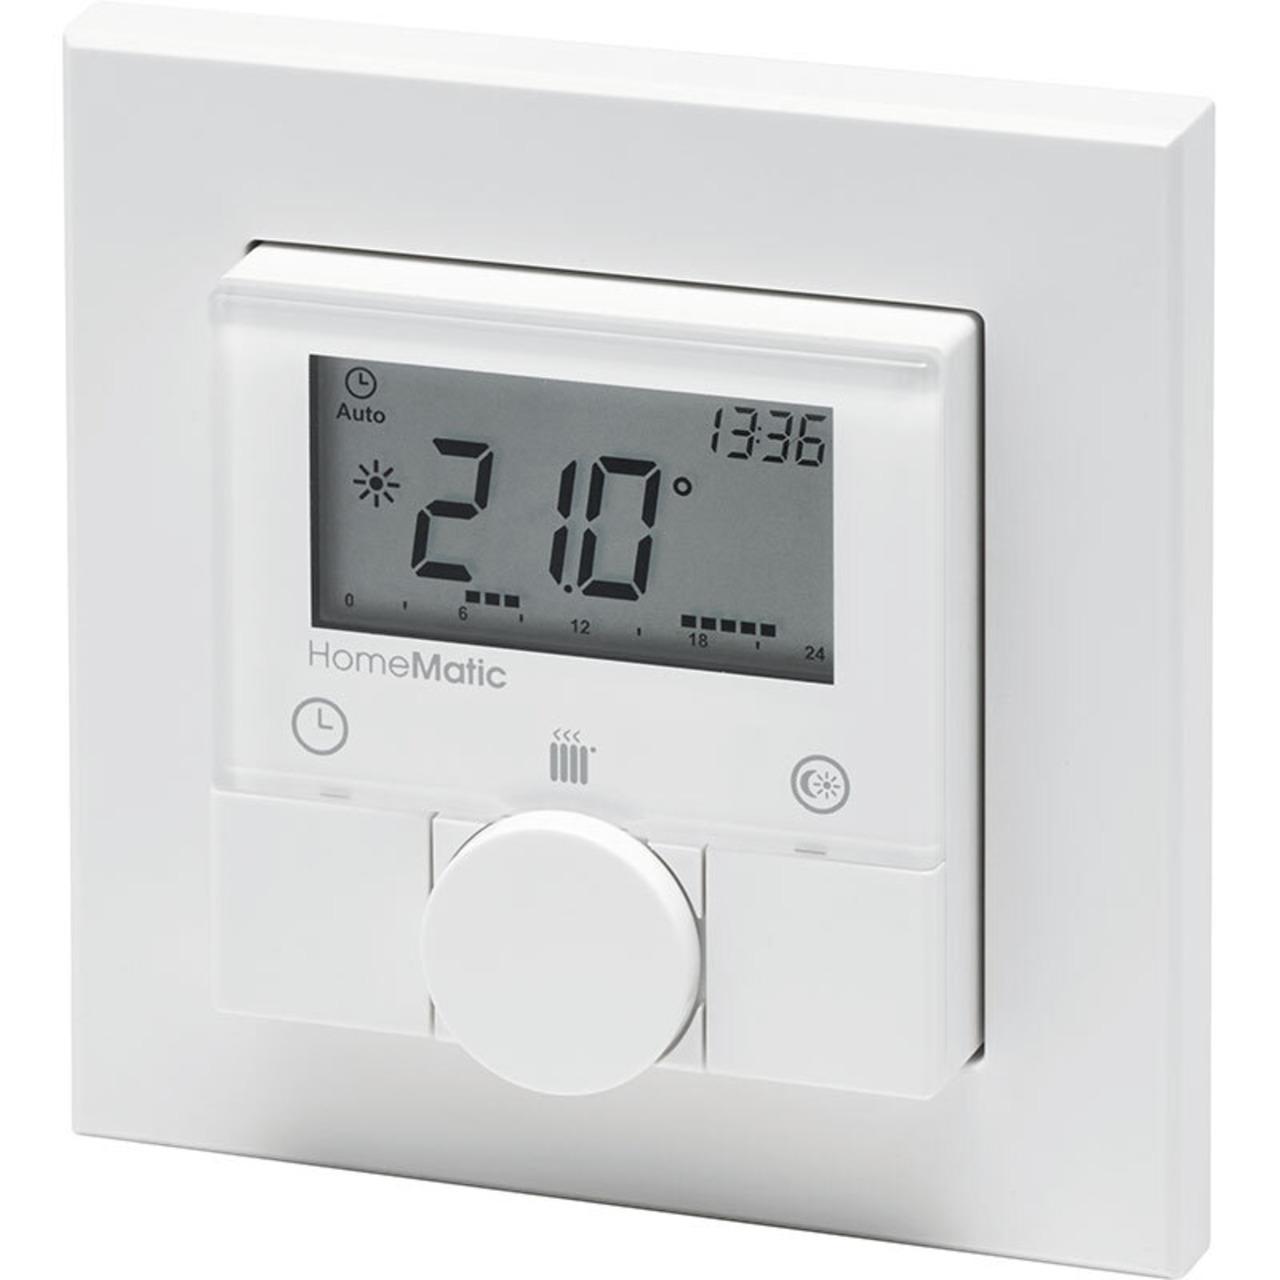 Homematic Funk-Wandthermostat HM-TC-IT-WM-W-EU für Smart Home - Hausautomation